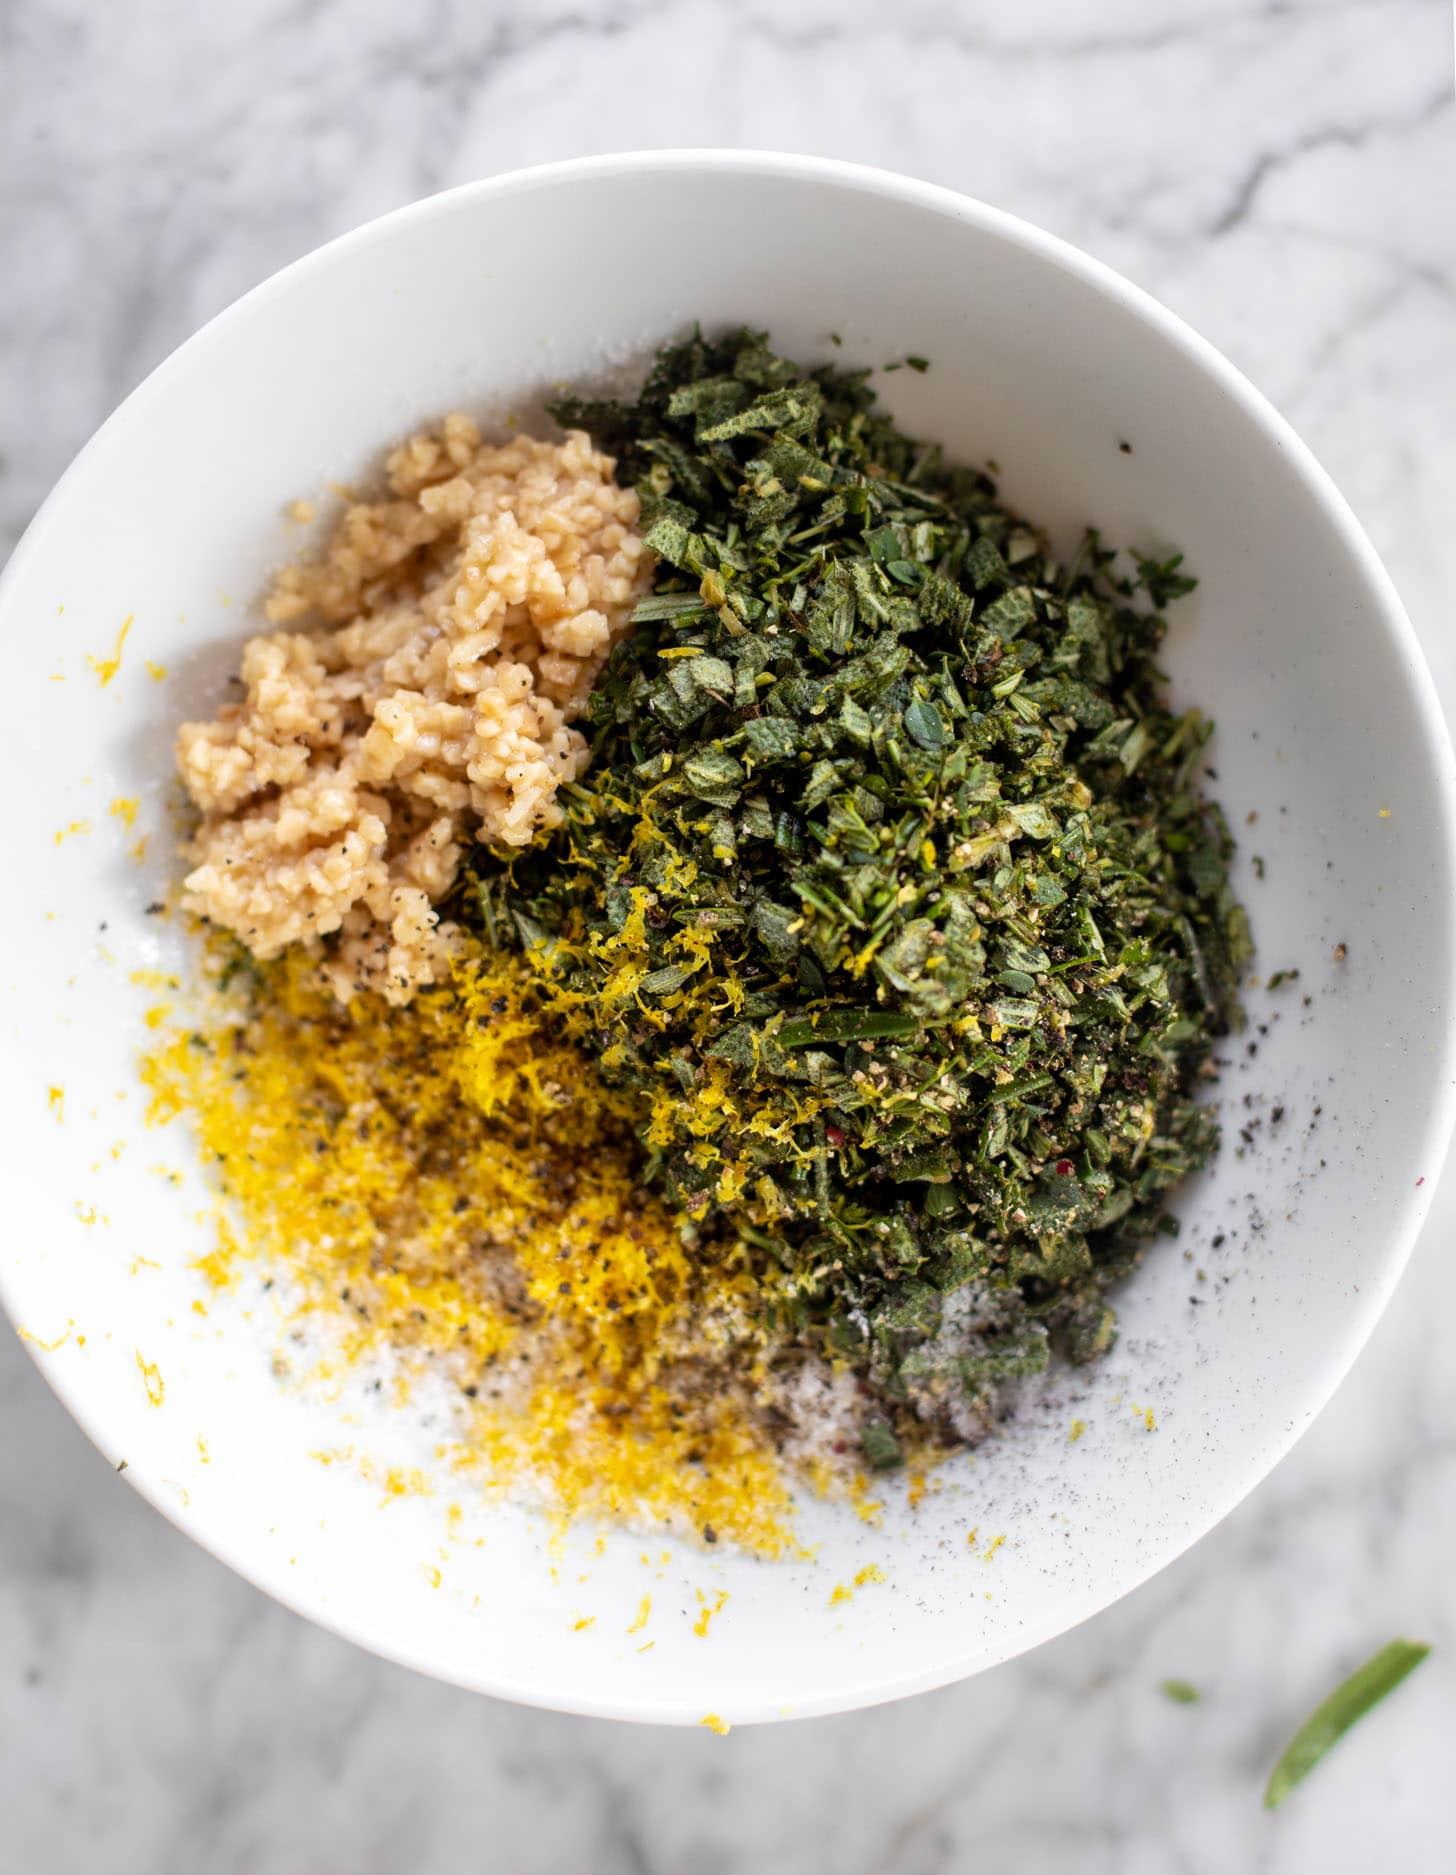 garlic, lemon zest, herbs